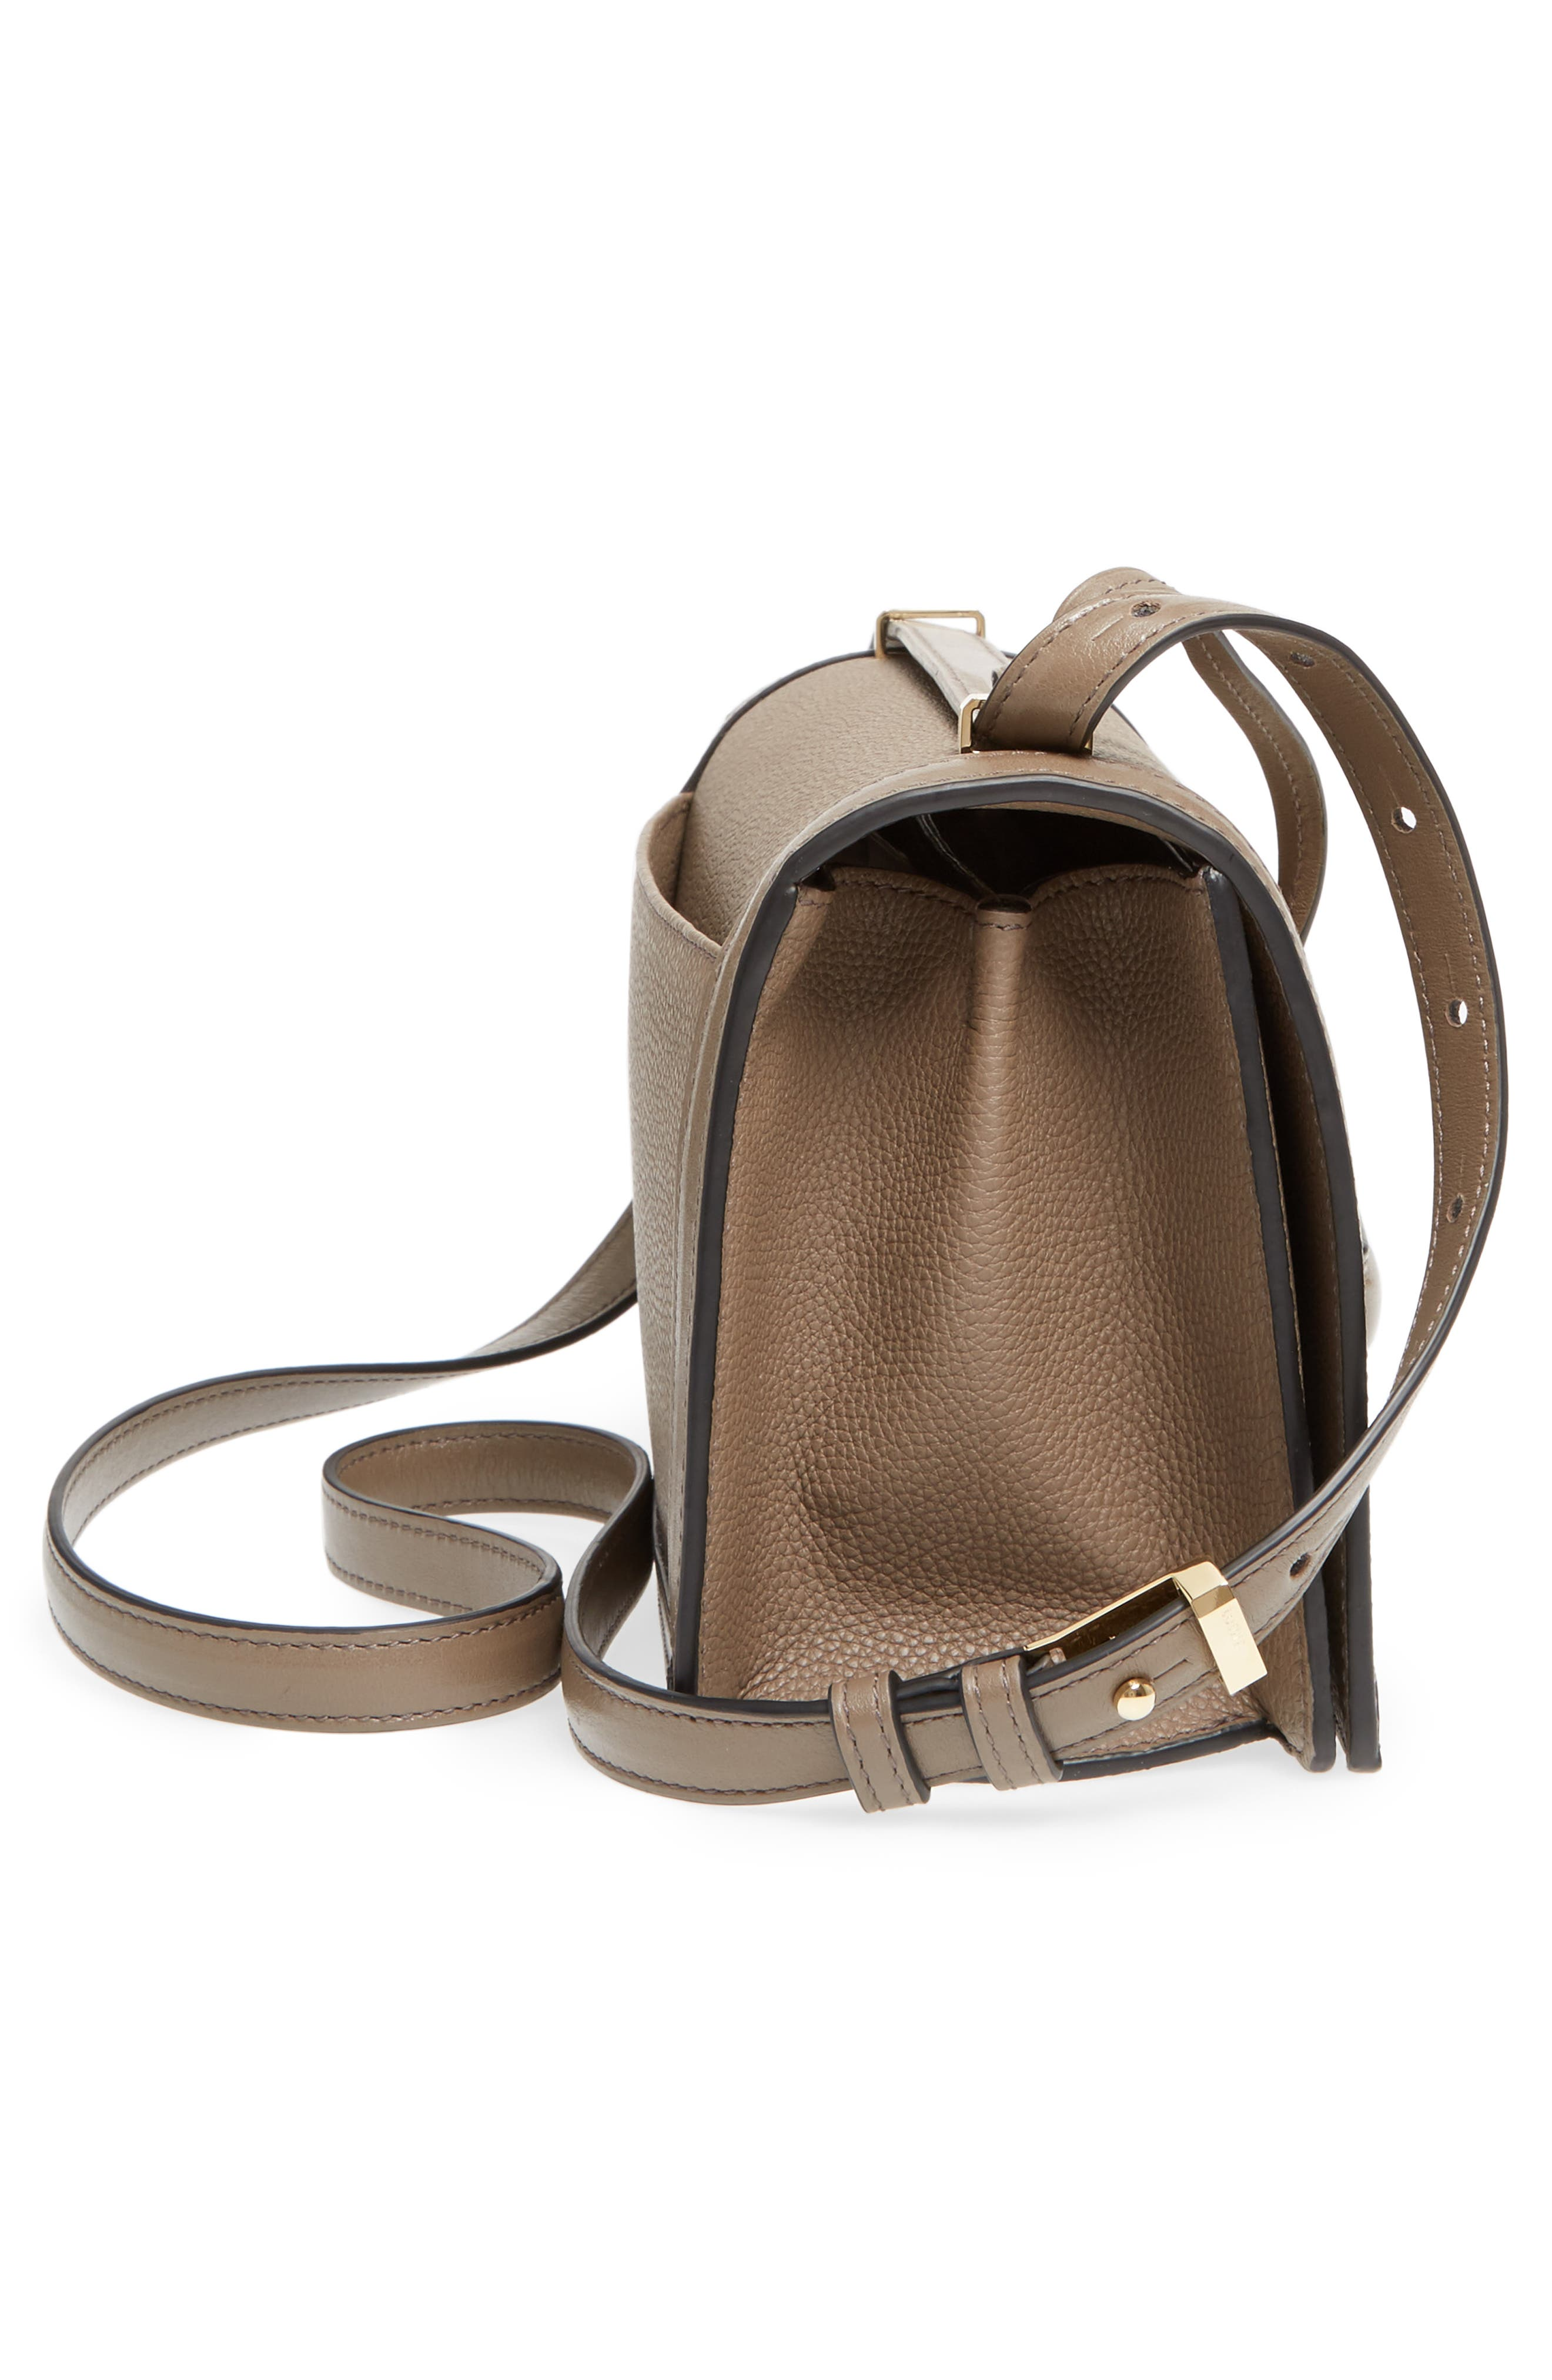 Medium Barcelona Leather Crossbody Bag,                             Alternate thumbnail 5, color,